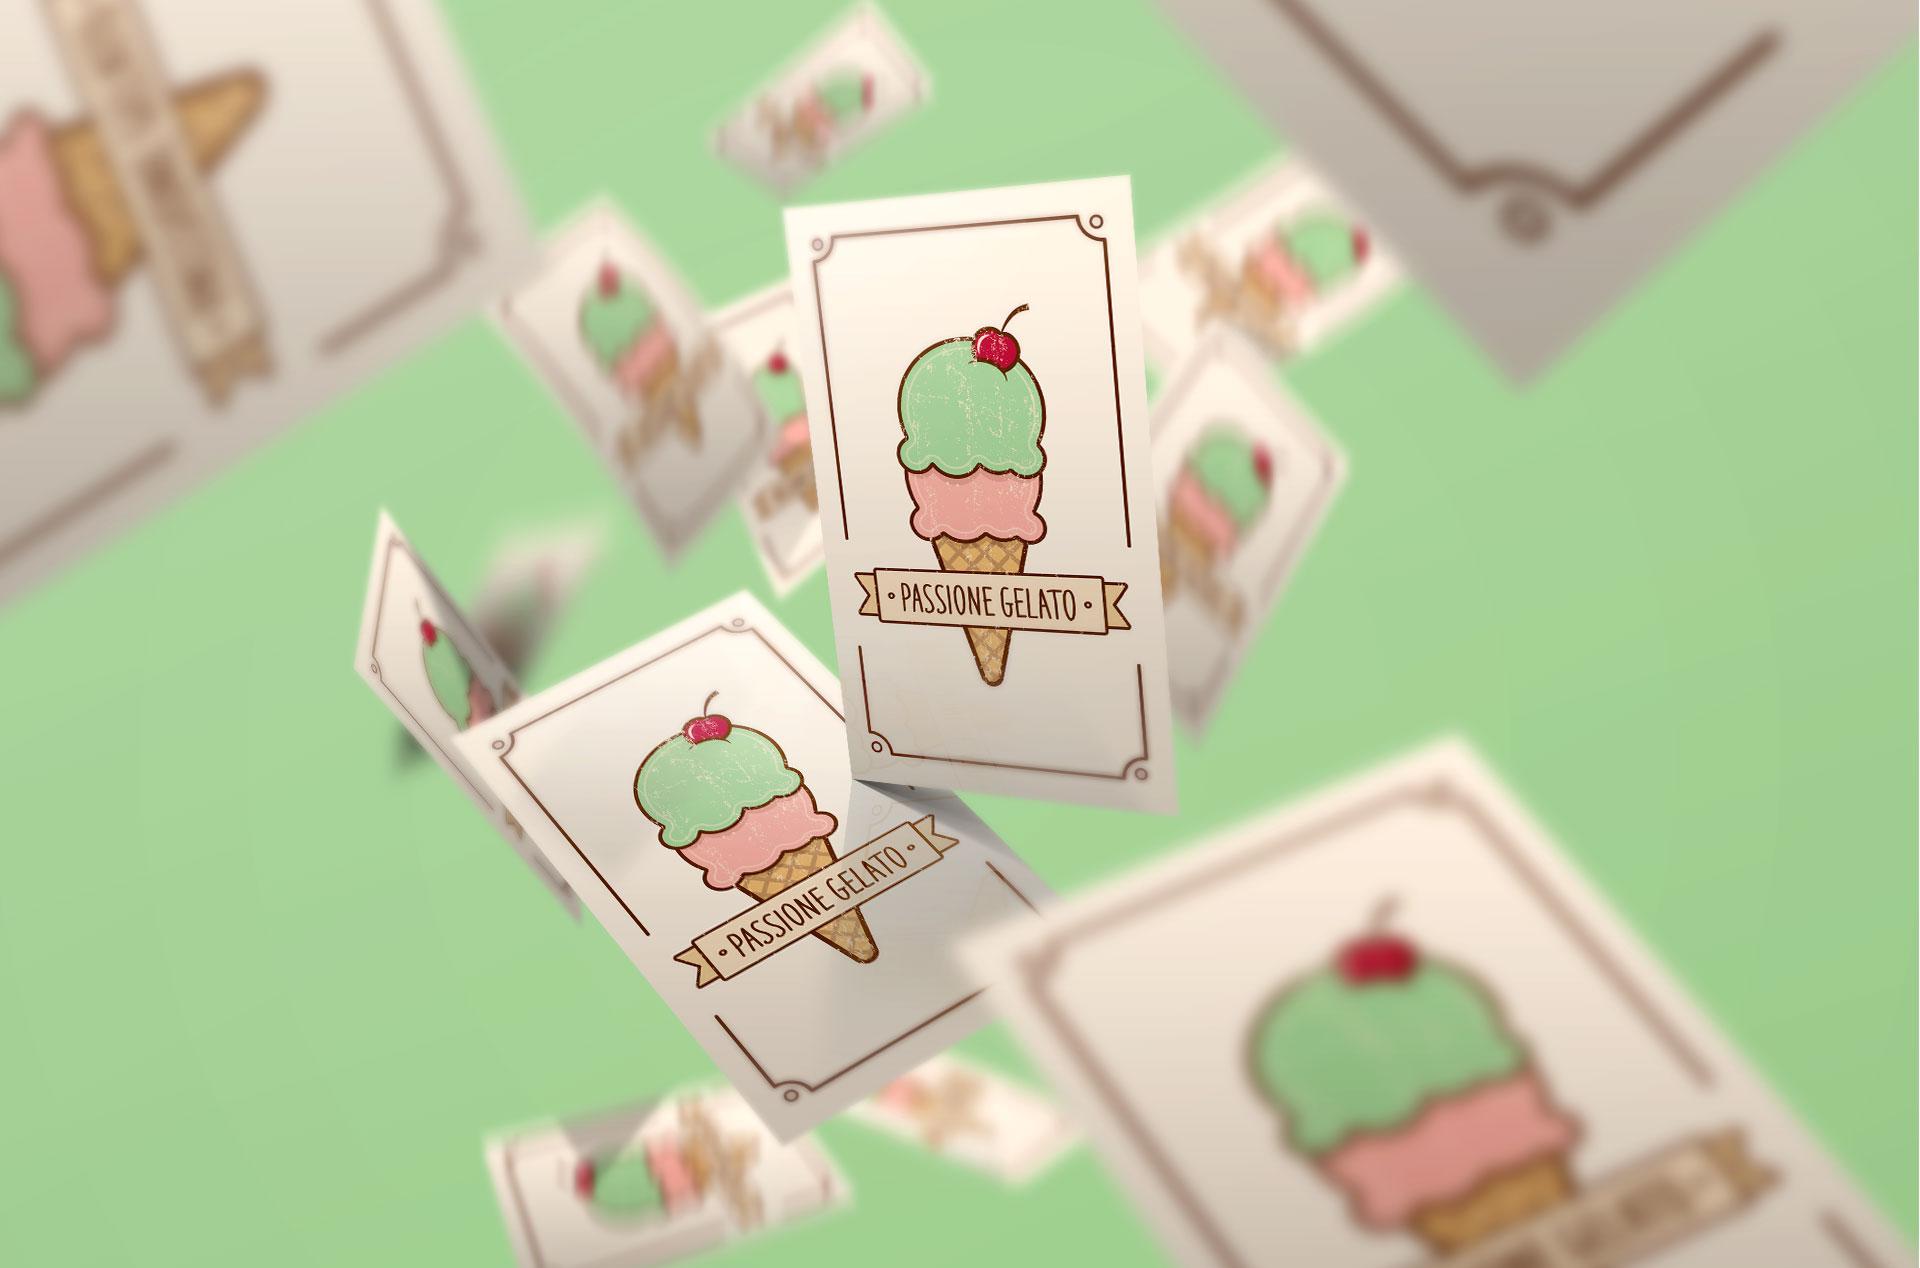 Passione-gelato-business-cards-016studio